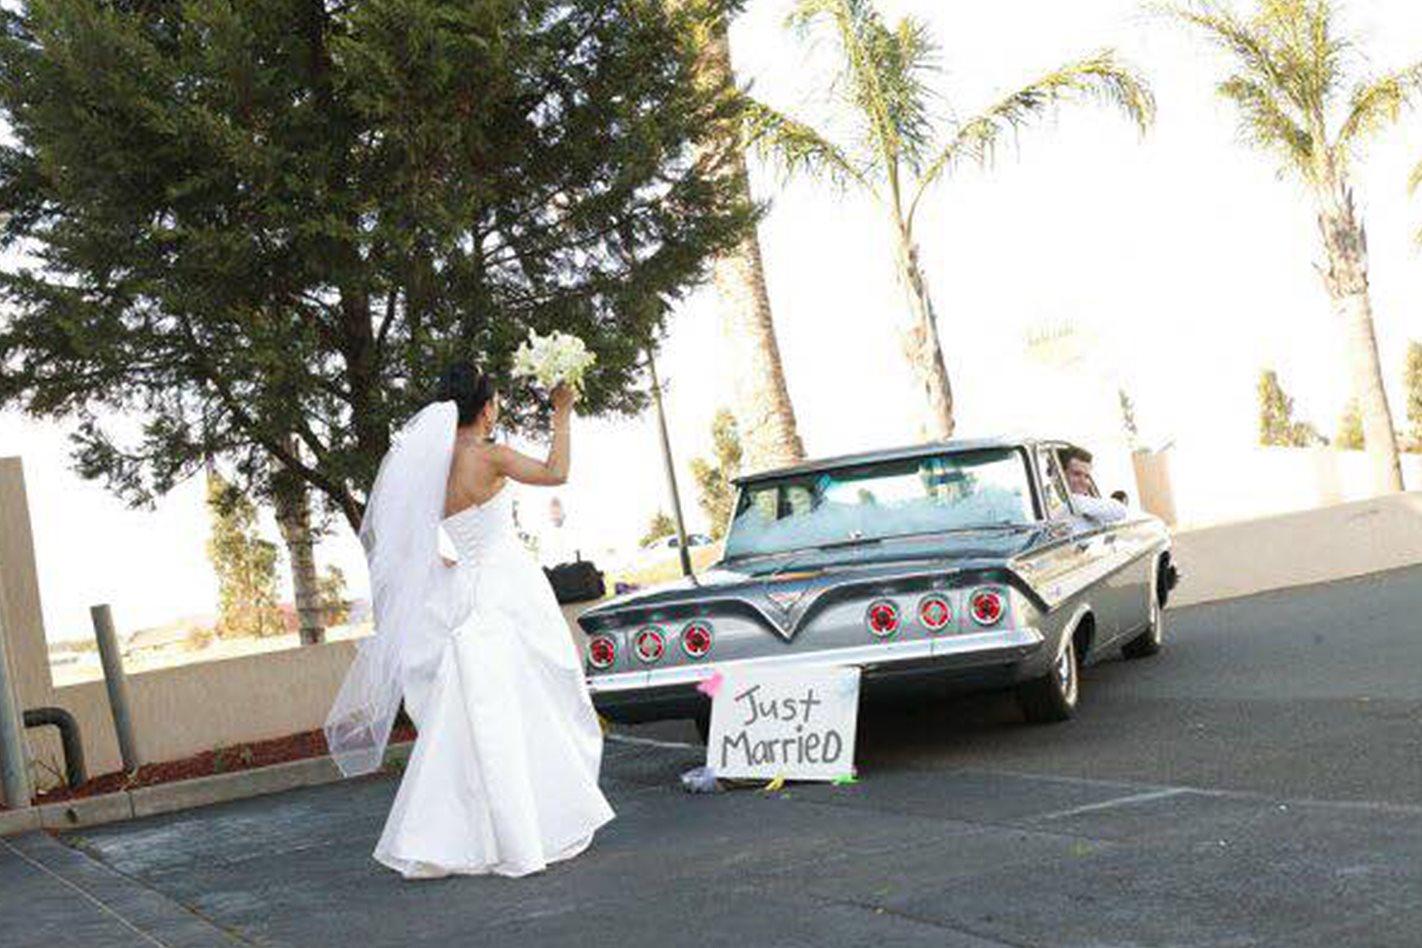 Victor's wedding car